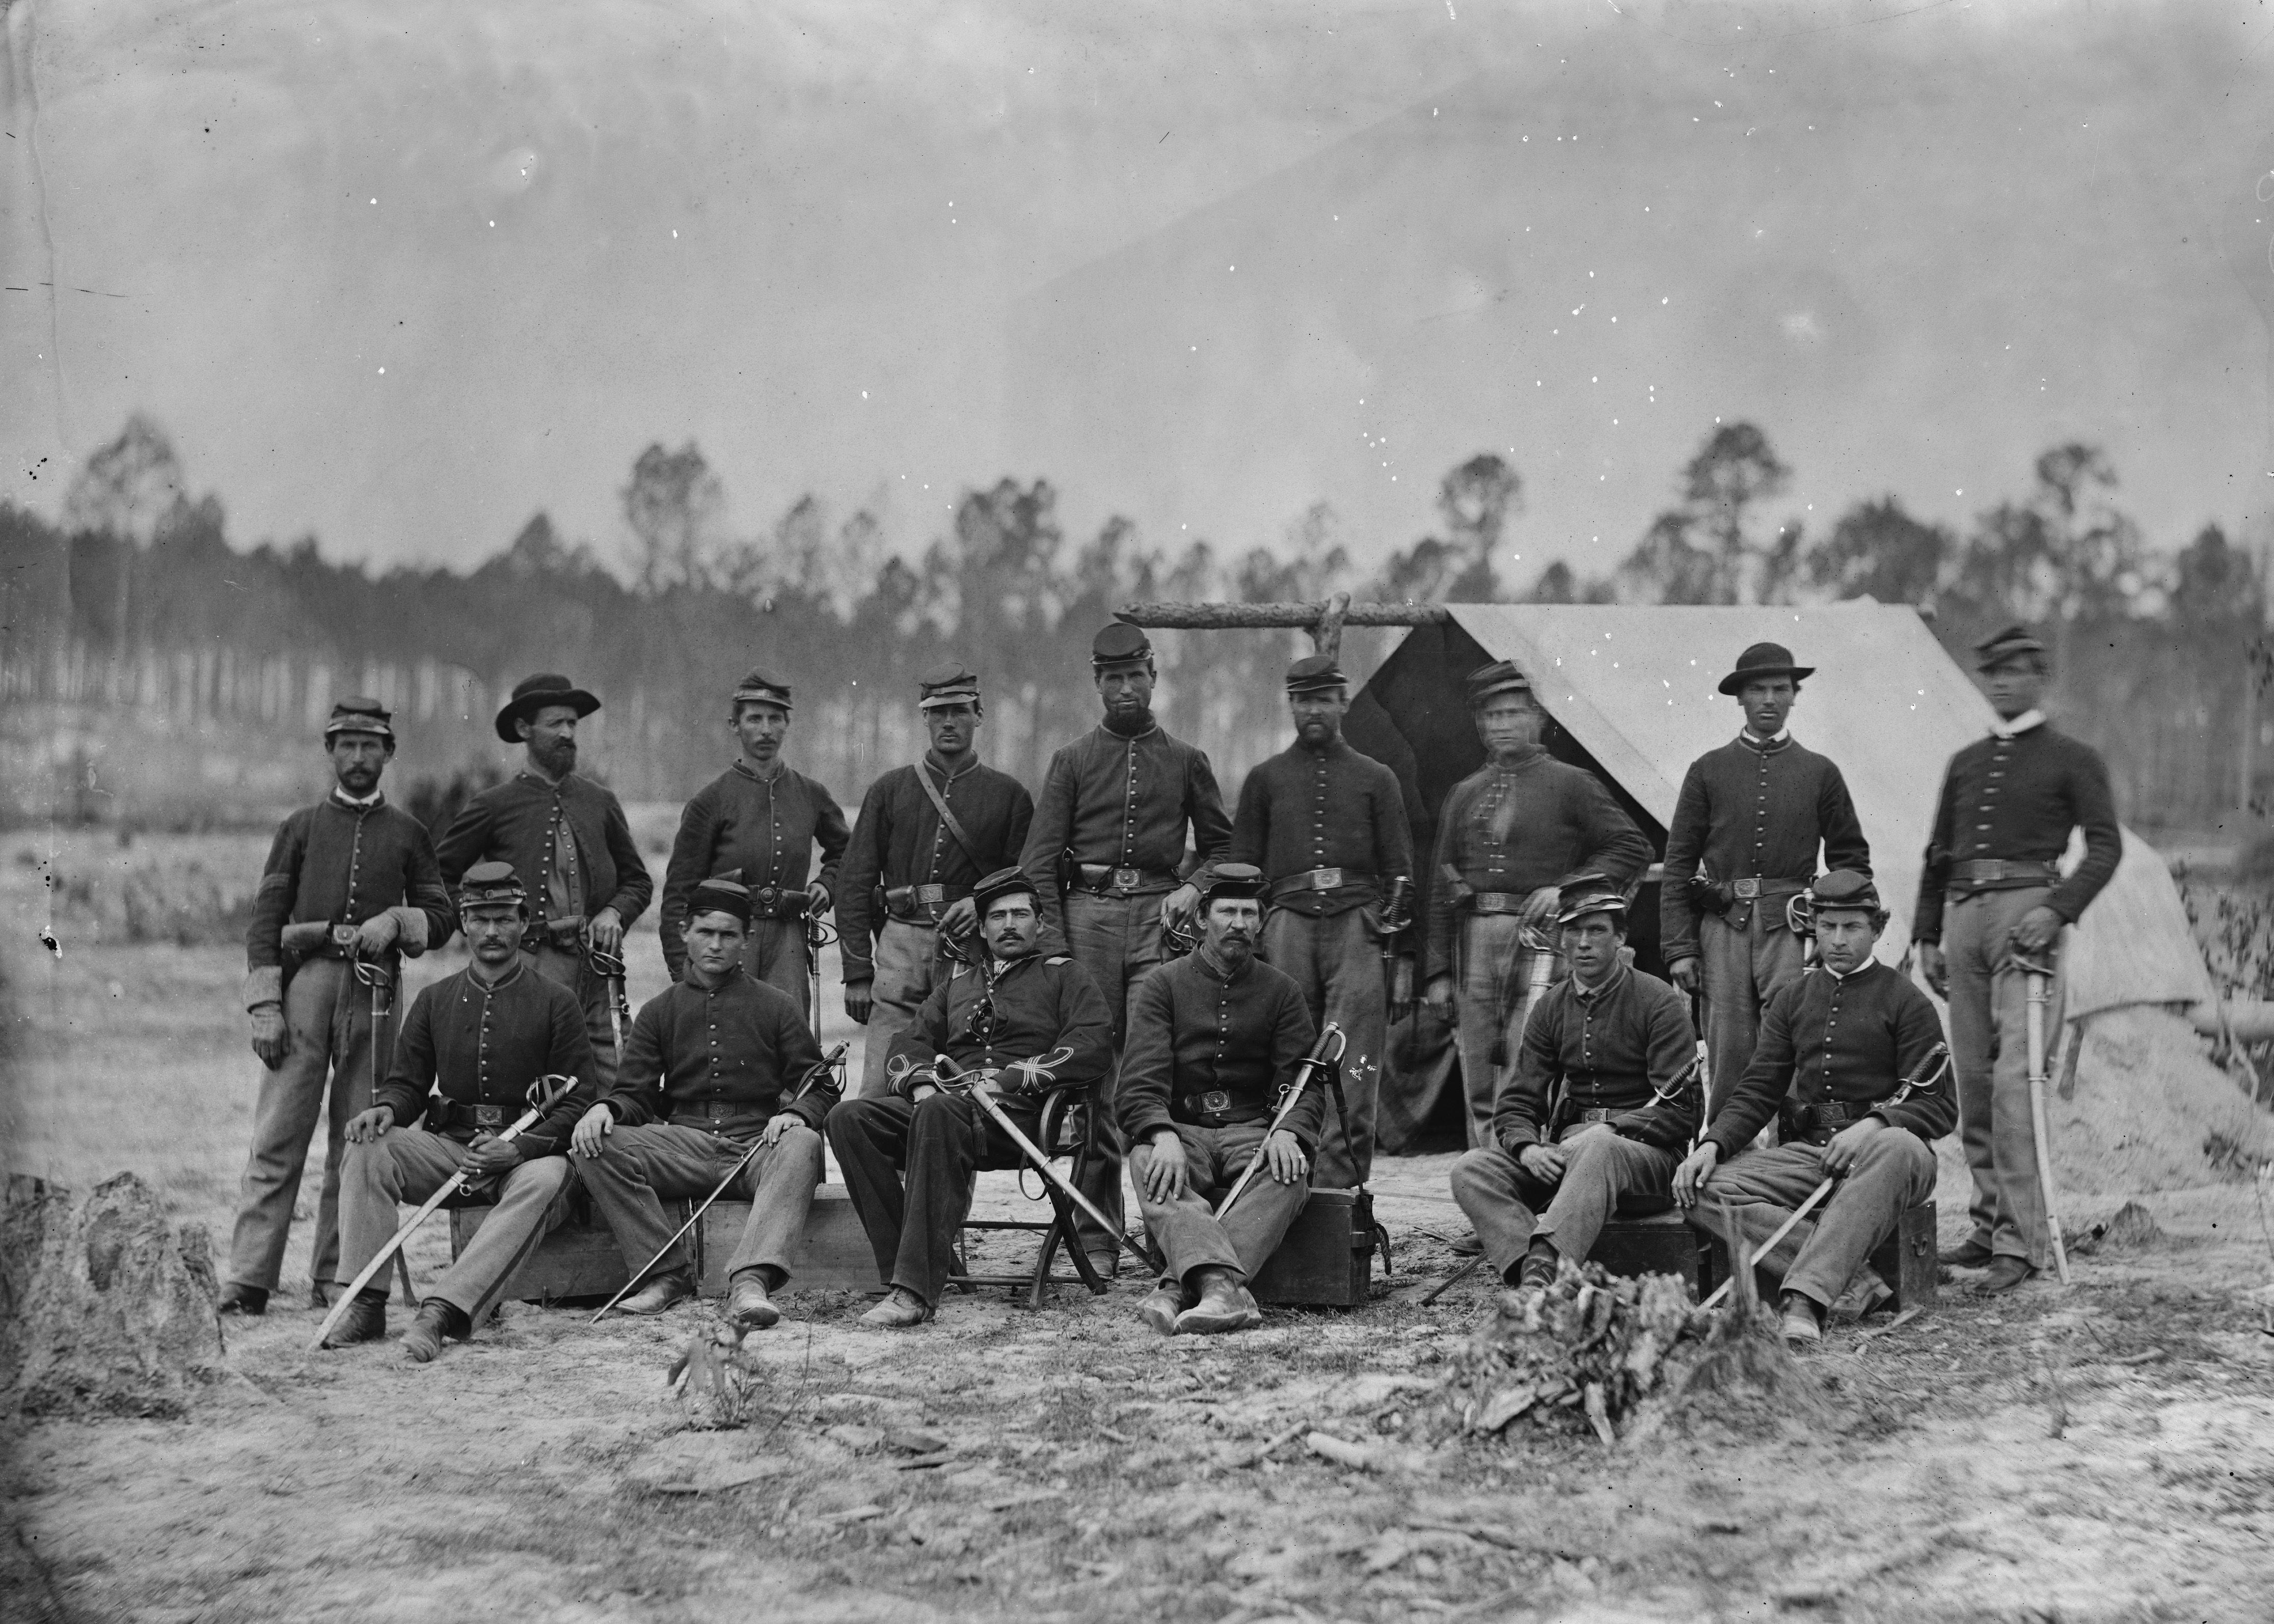 Civil War: Petersburg. /Nunion ArmyS Fort Sedgwick During